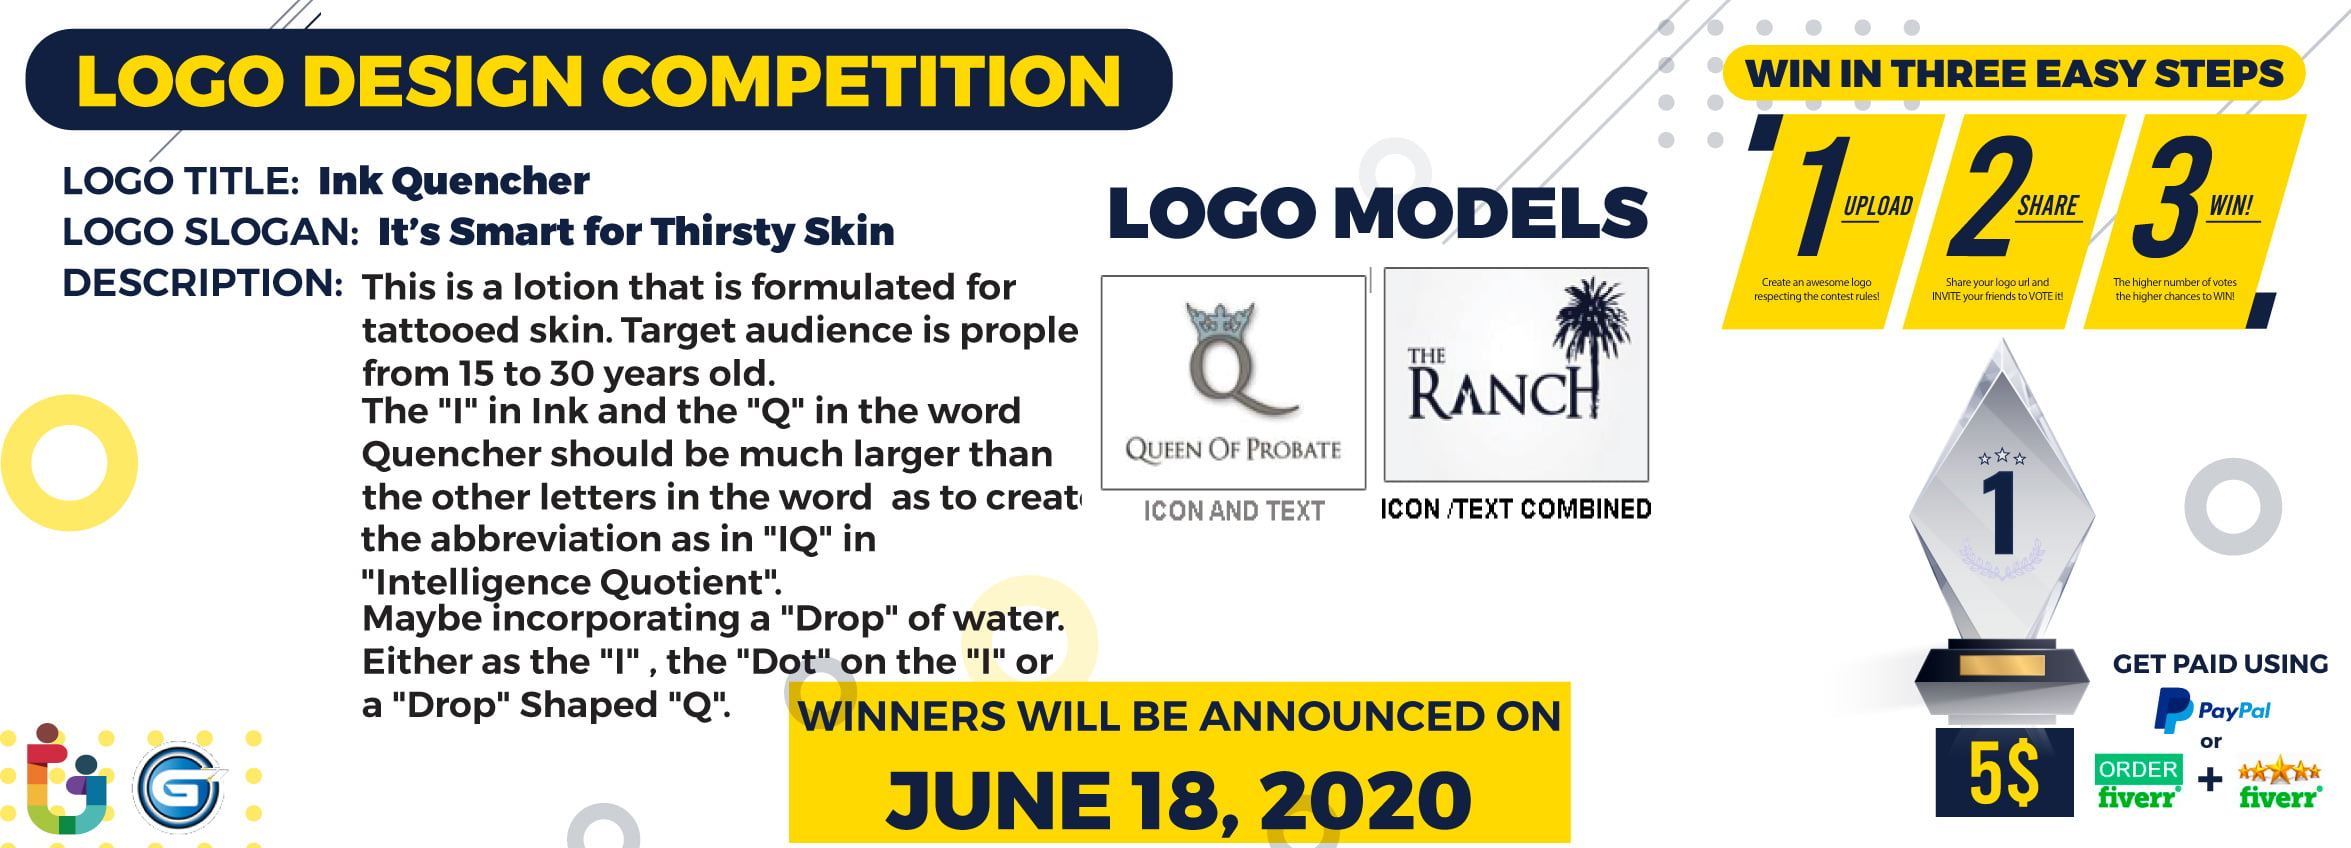 Ink-Quercher-Logo-Design-Contest-